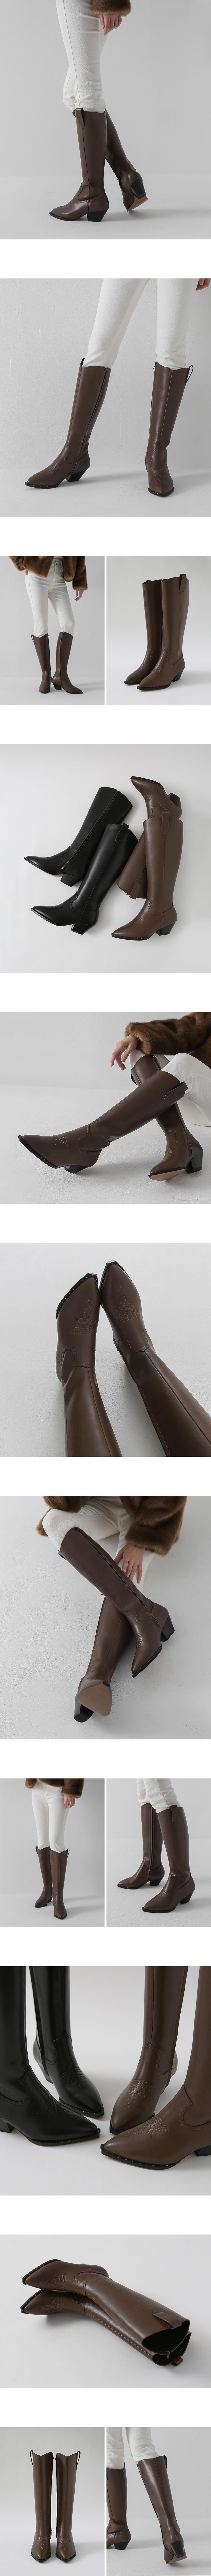 Brotte Stud Western Boots BLLTT4c226